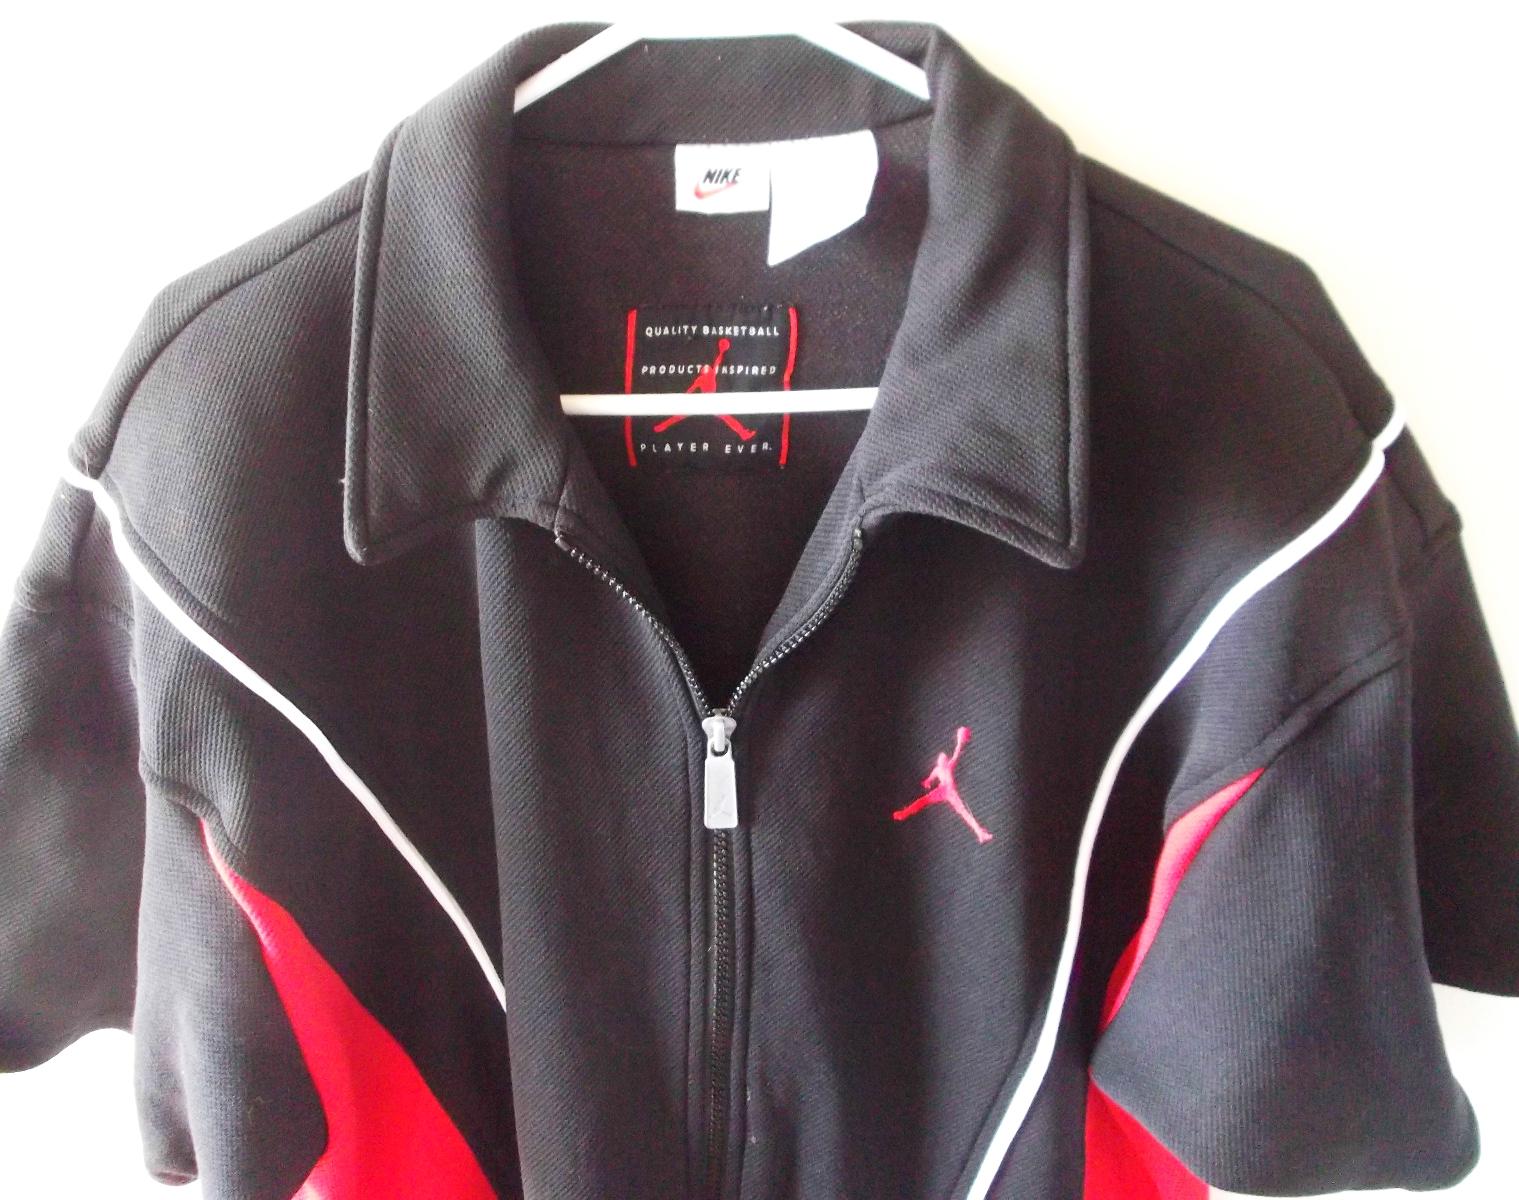 Vintage Gear: Air Jordan Warm Up Jacket